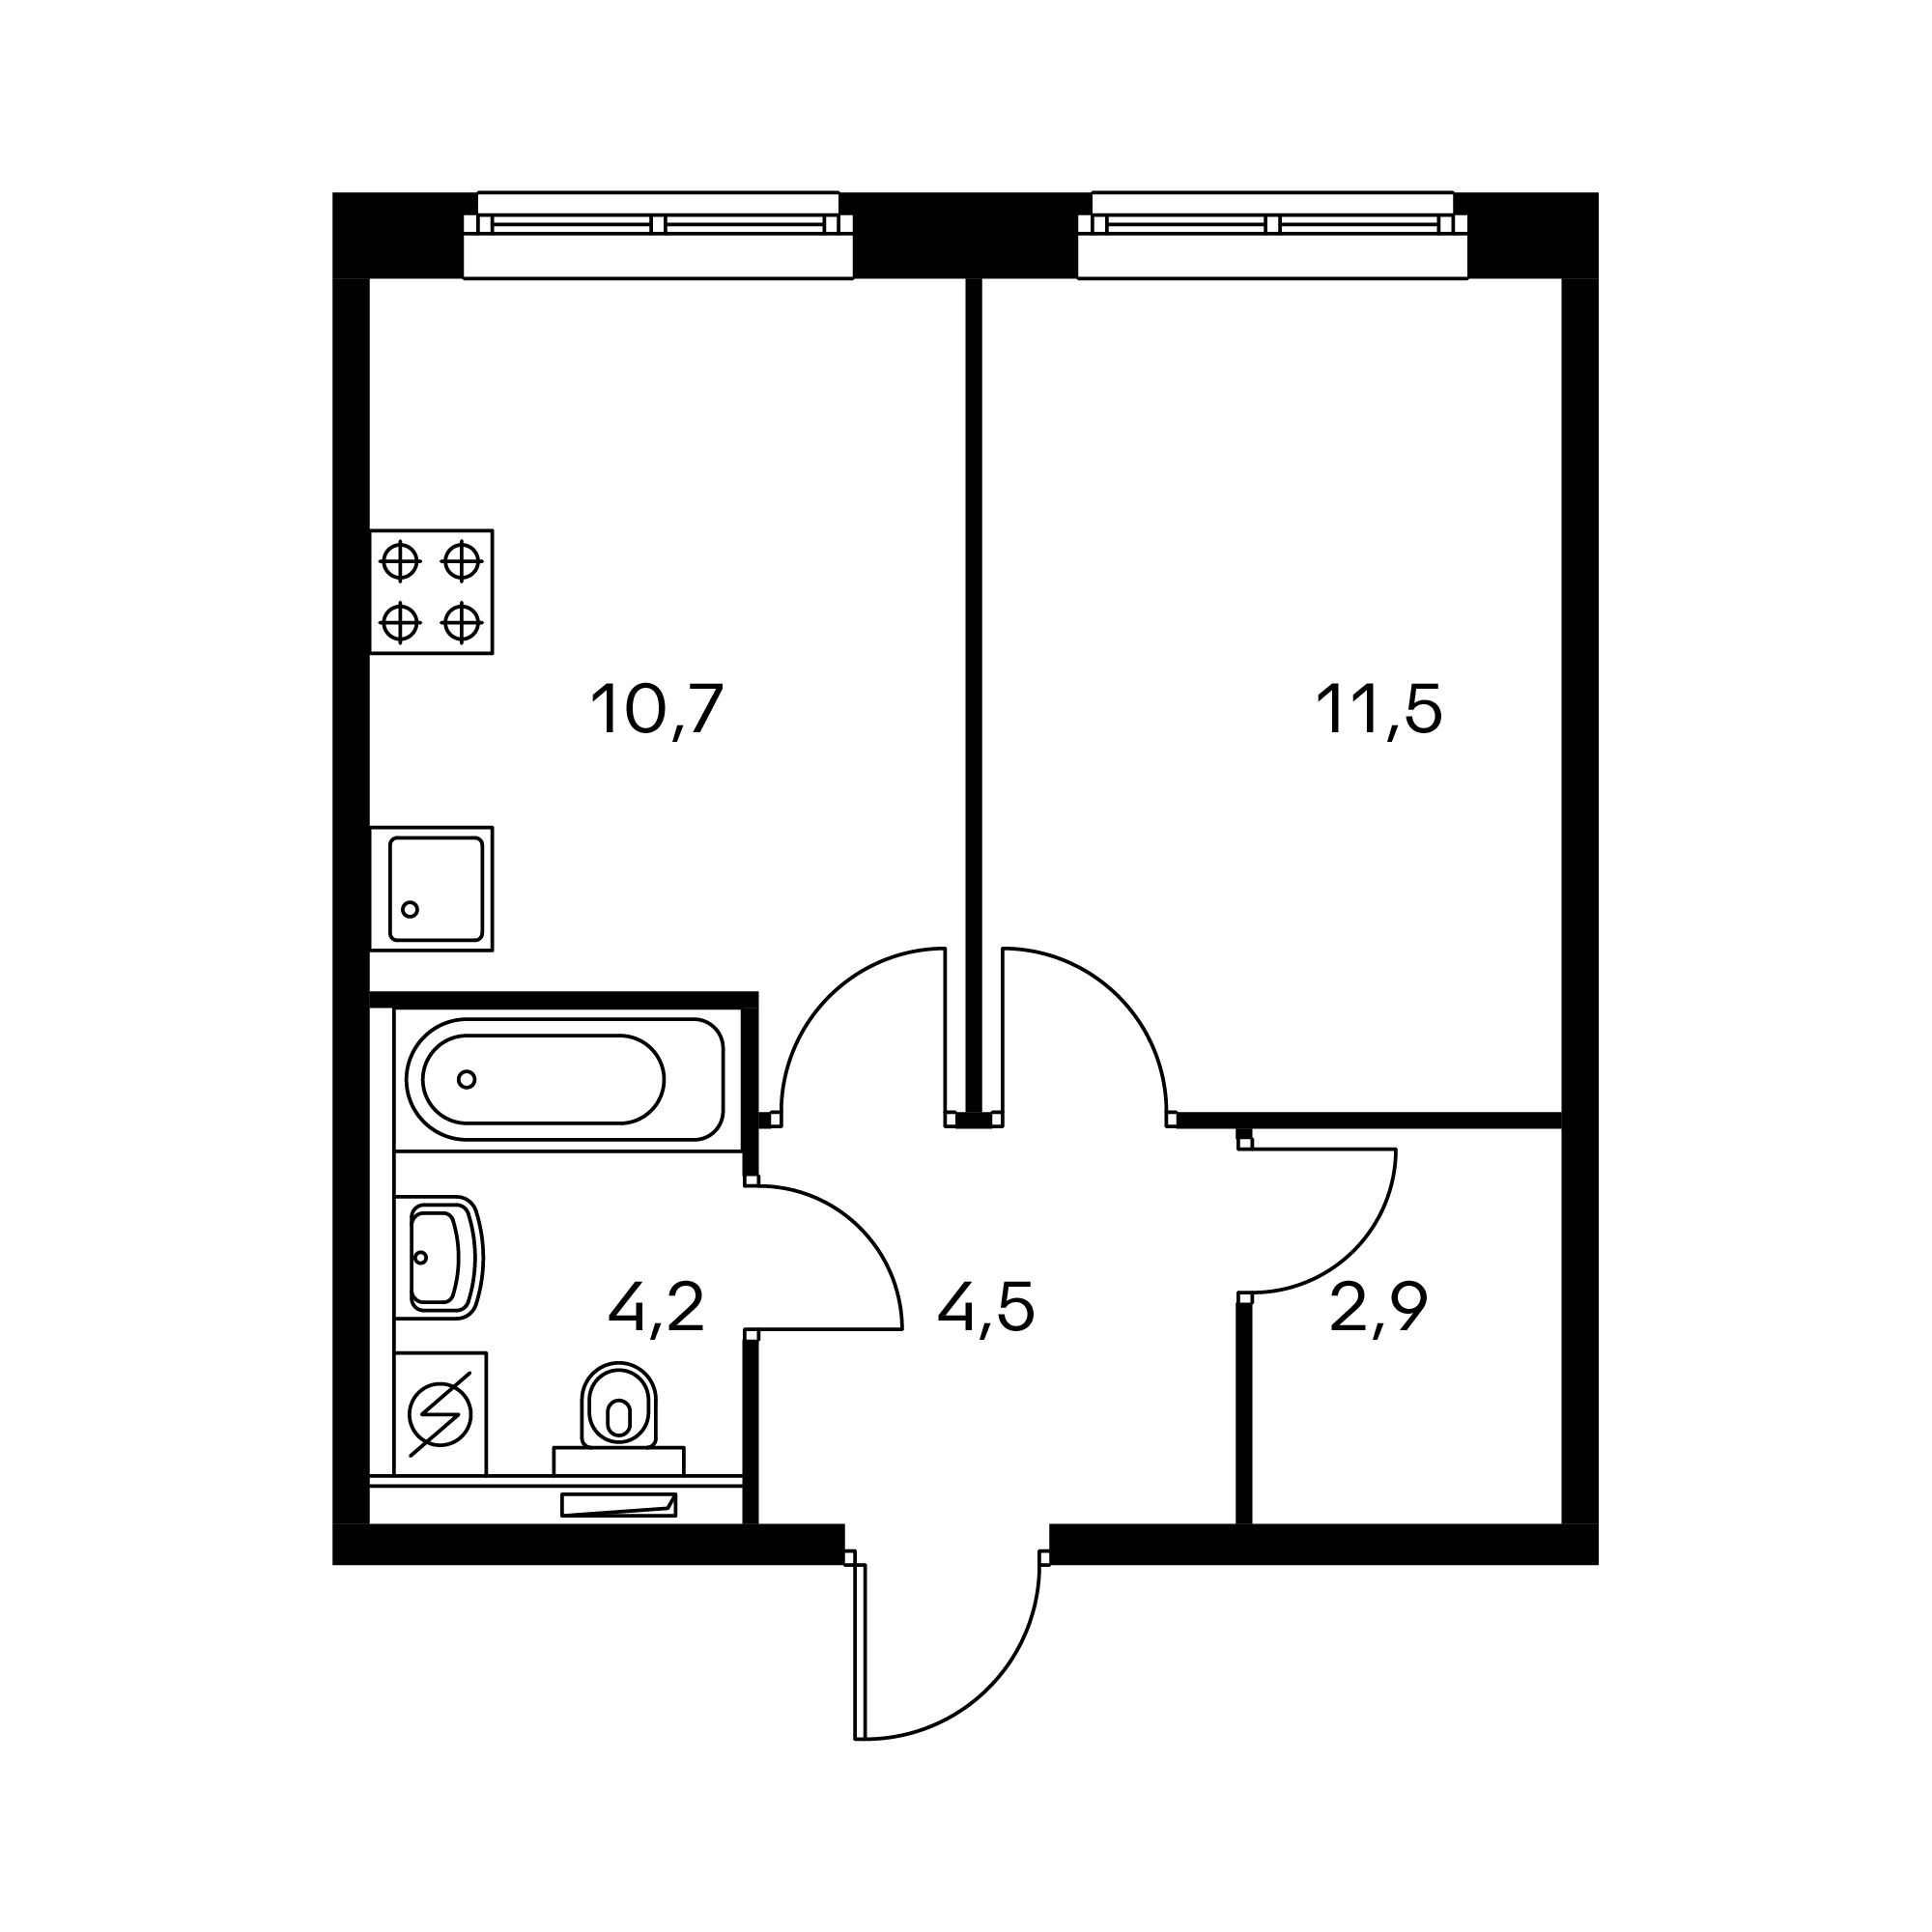 1KS1_6.0-1 (1)